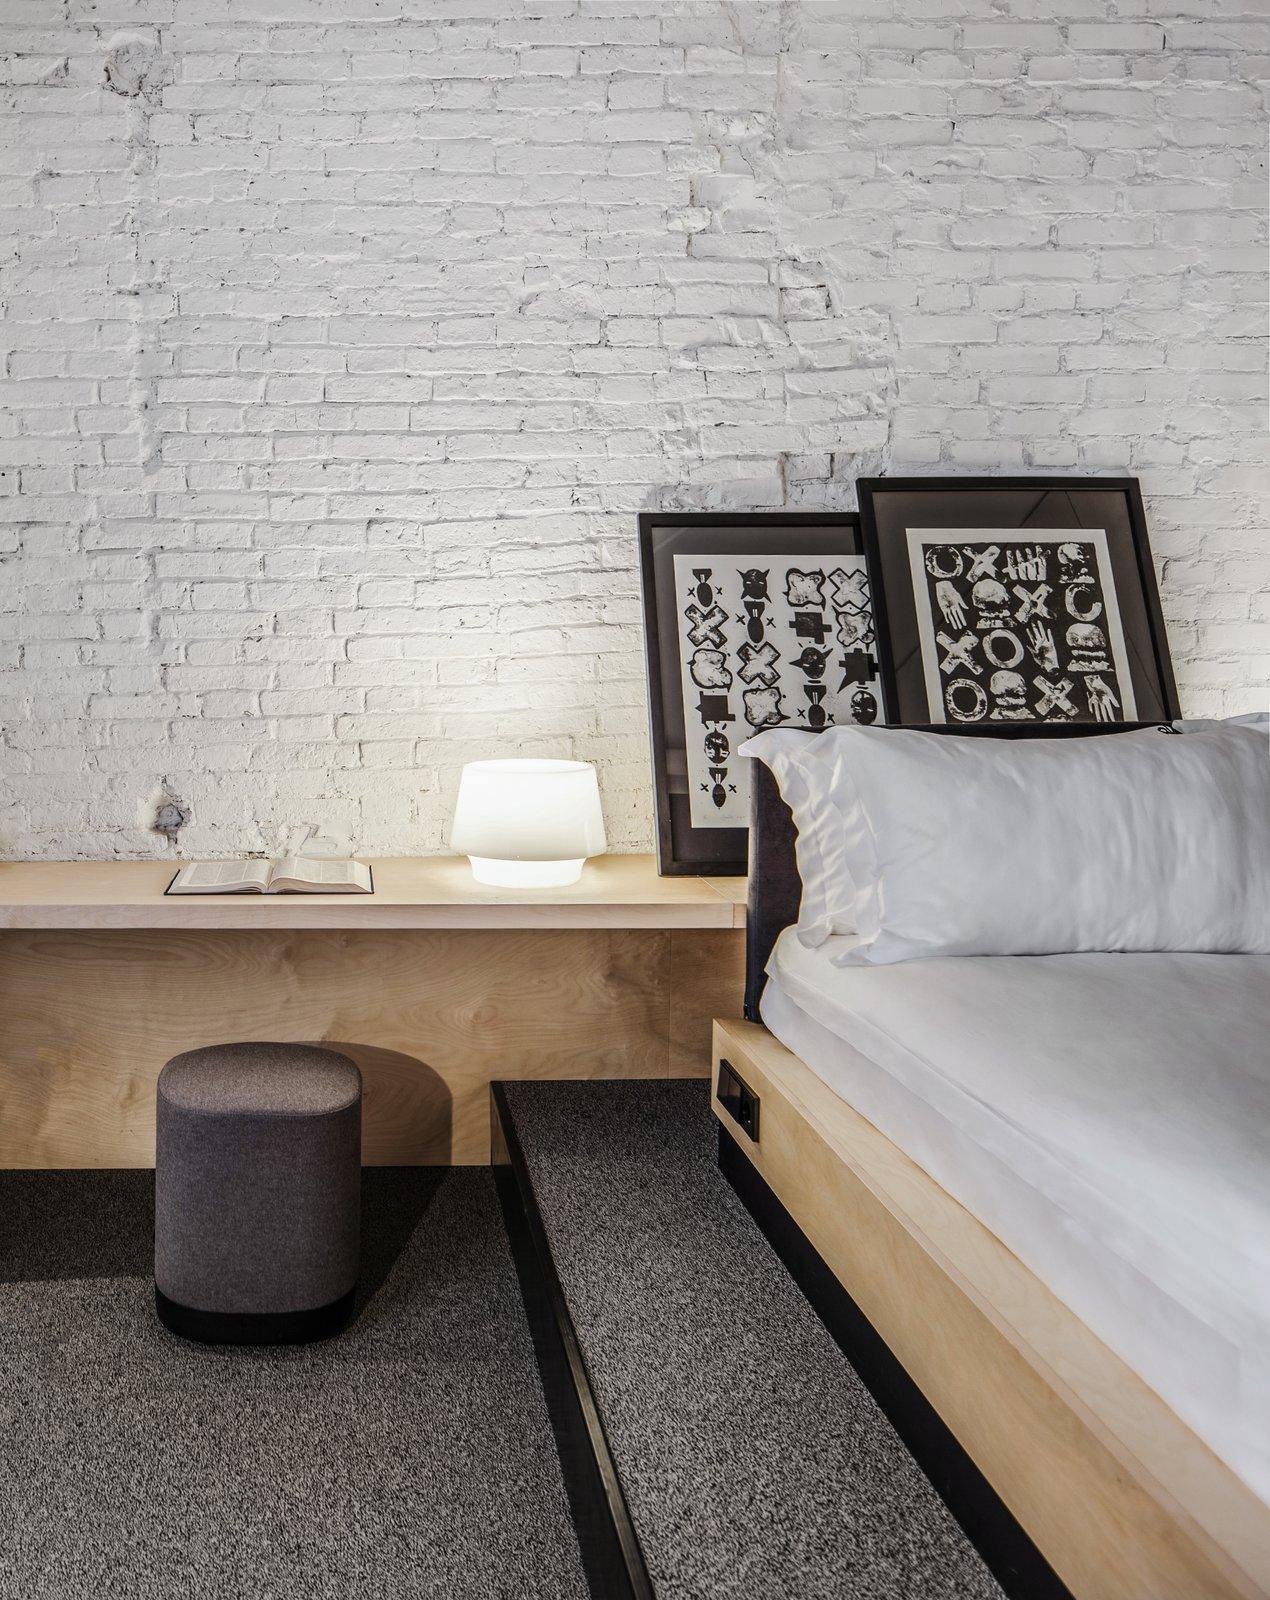 Bursa Hotel bedroom with whitewashed brick walls